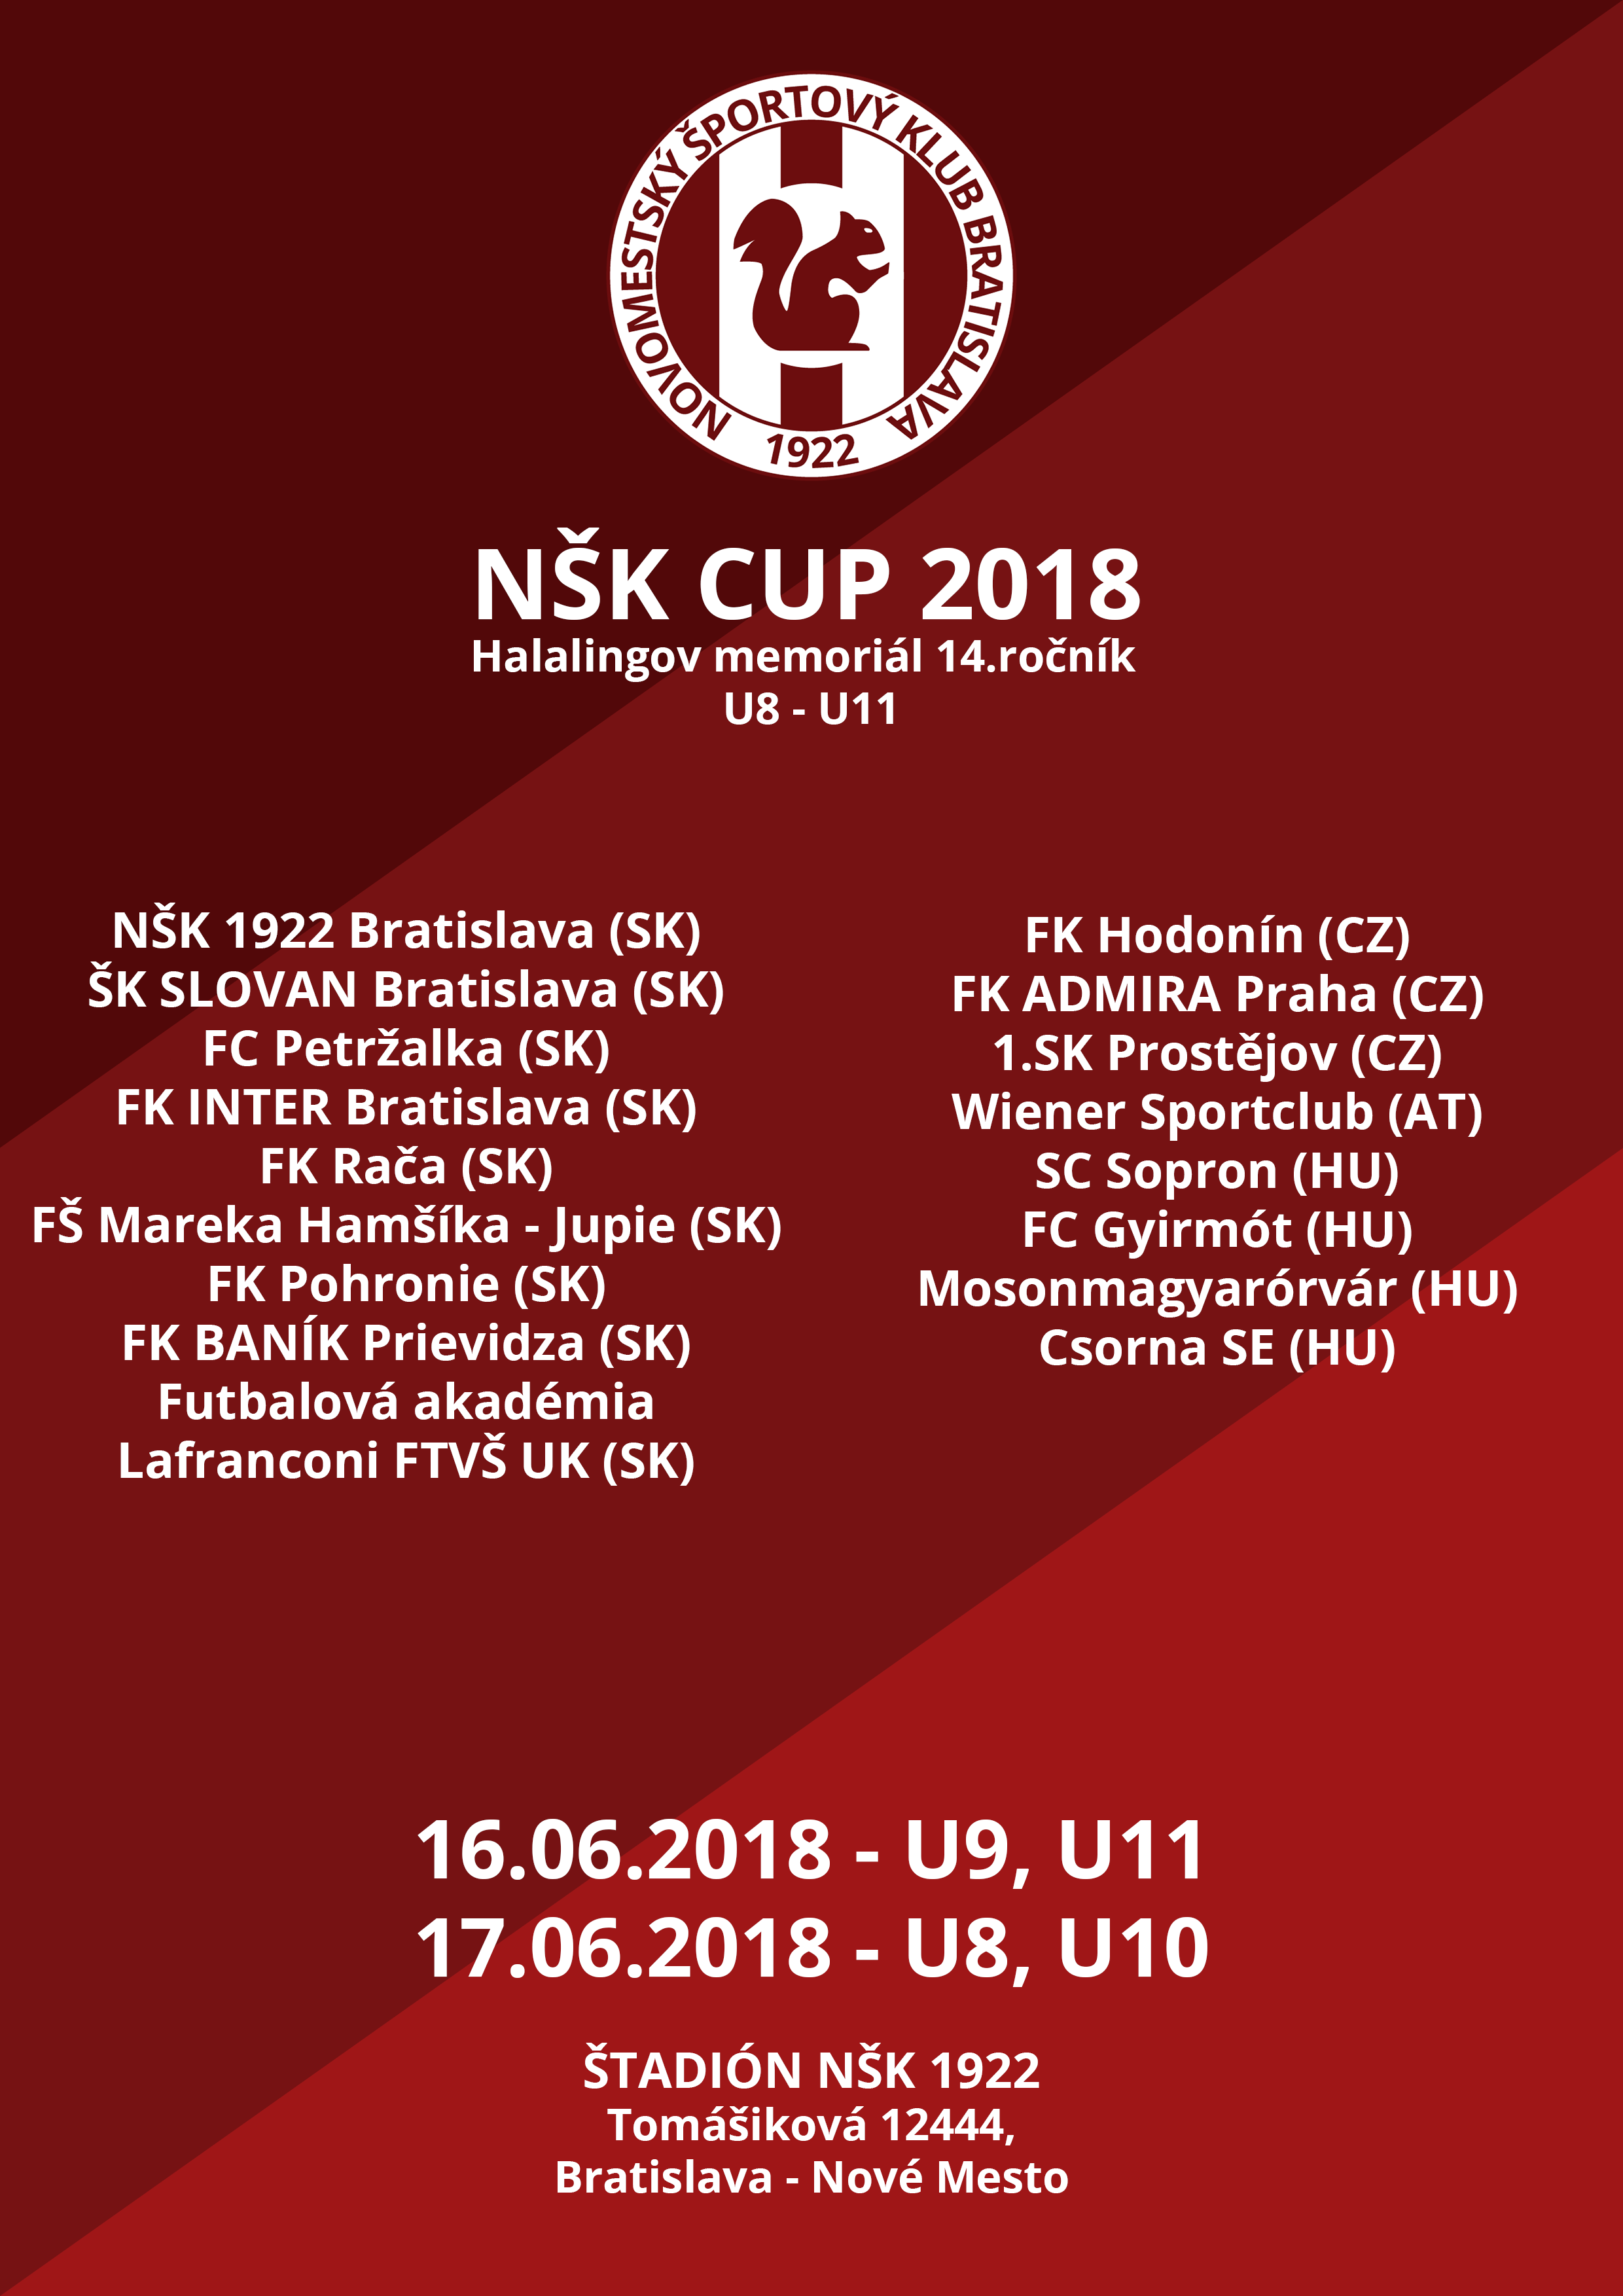 NŠK CUP 2018